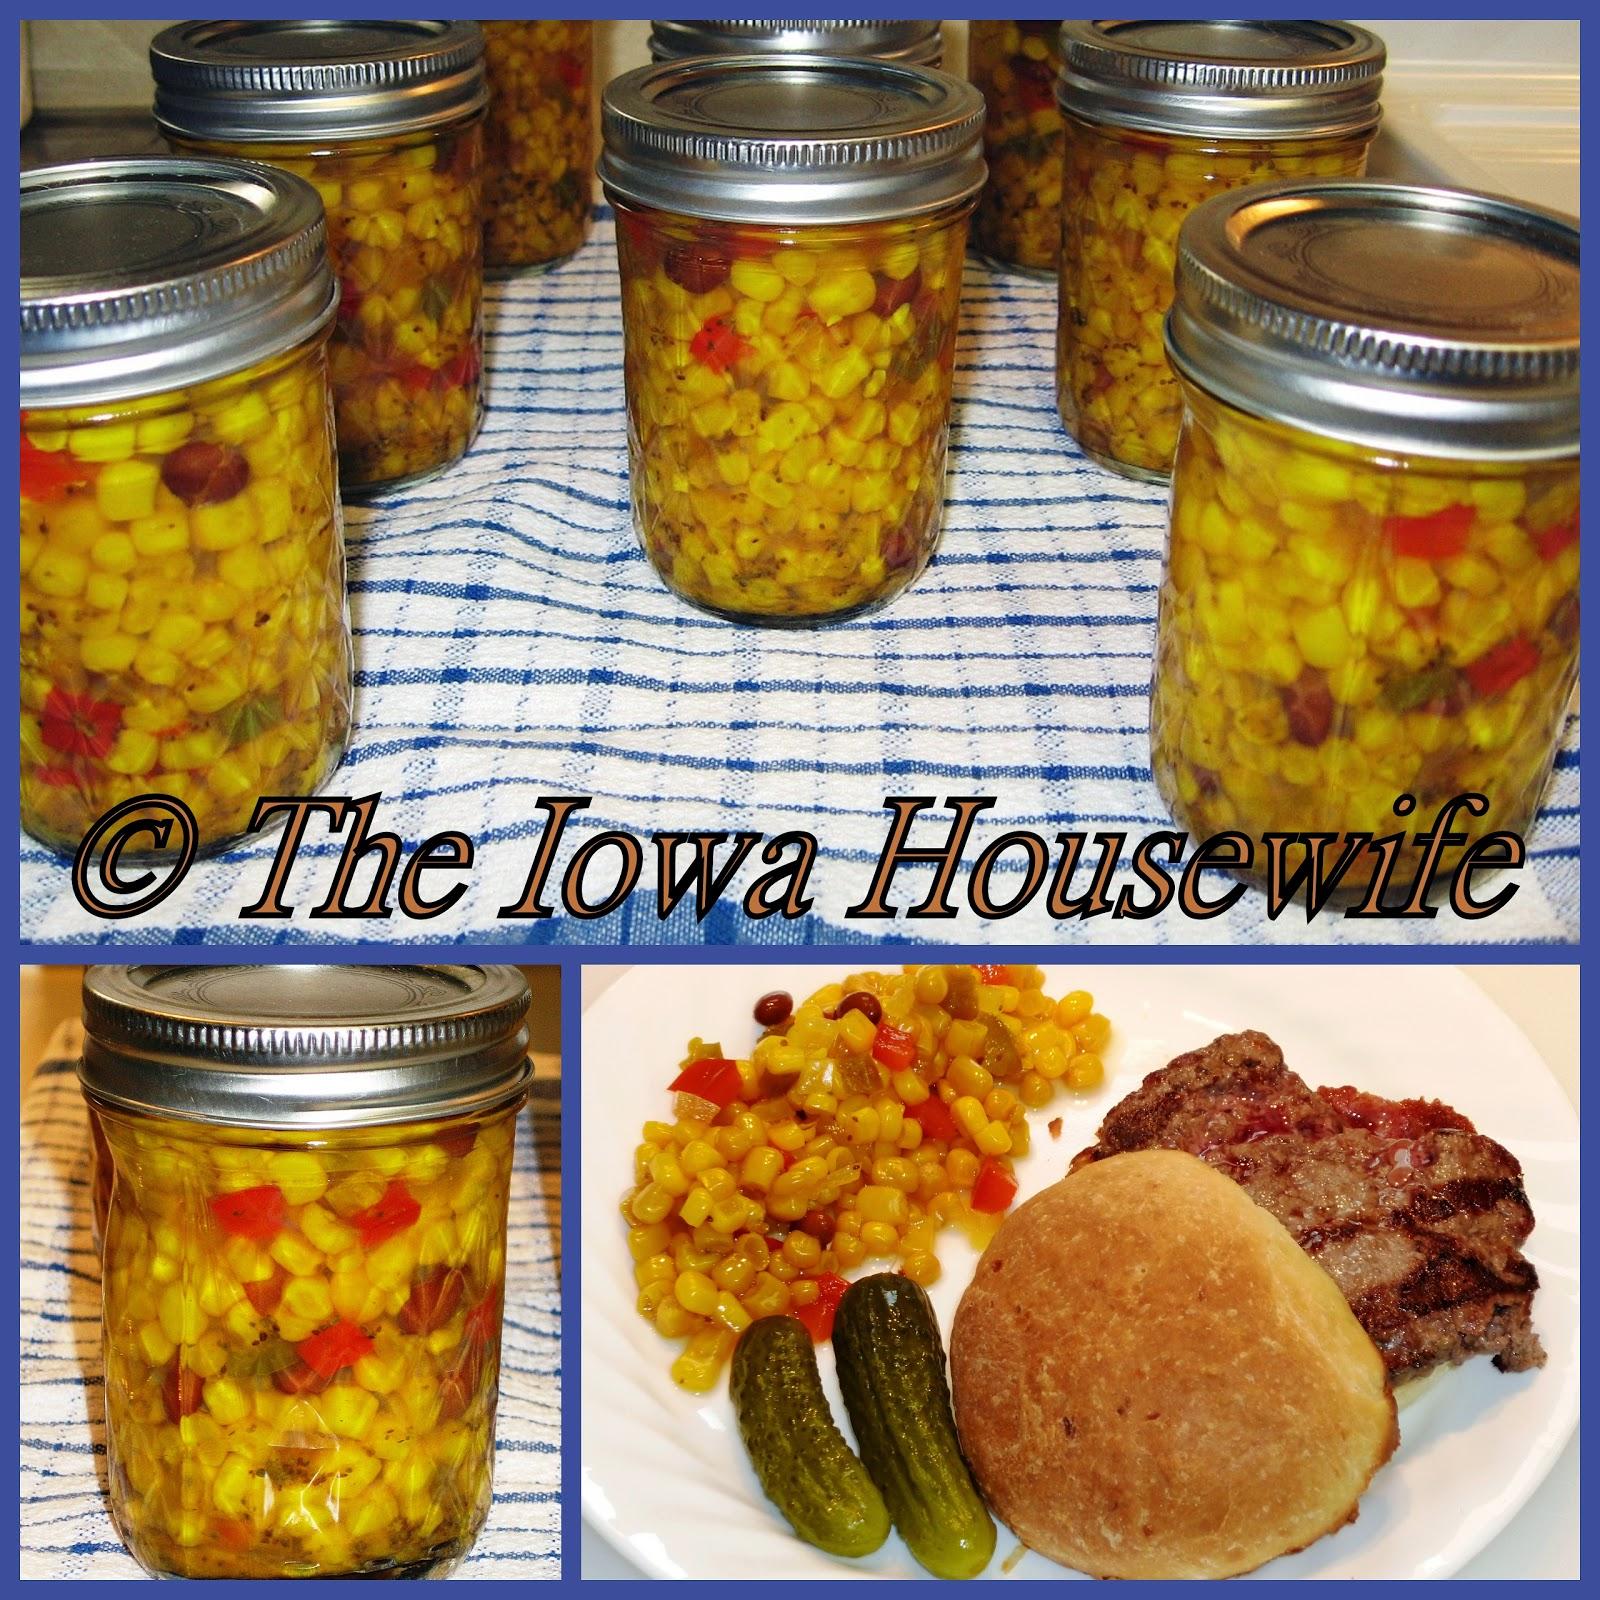 The Iowa Housewife: Sue's Easy Corn Relish